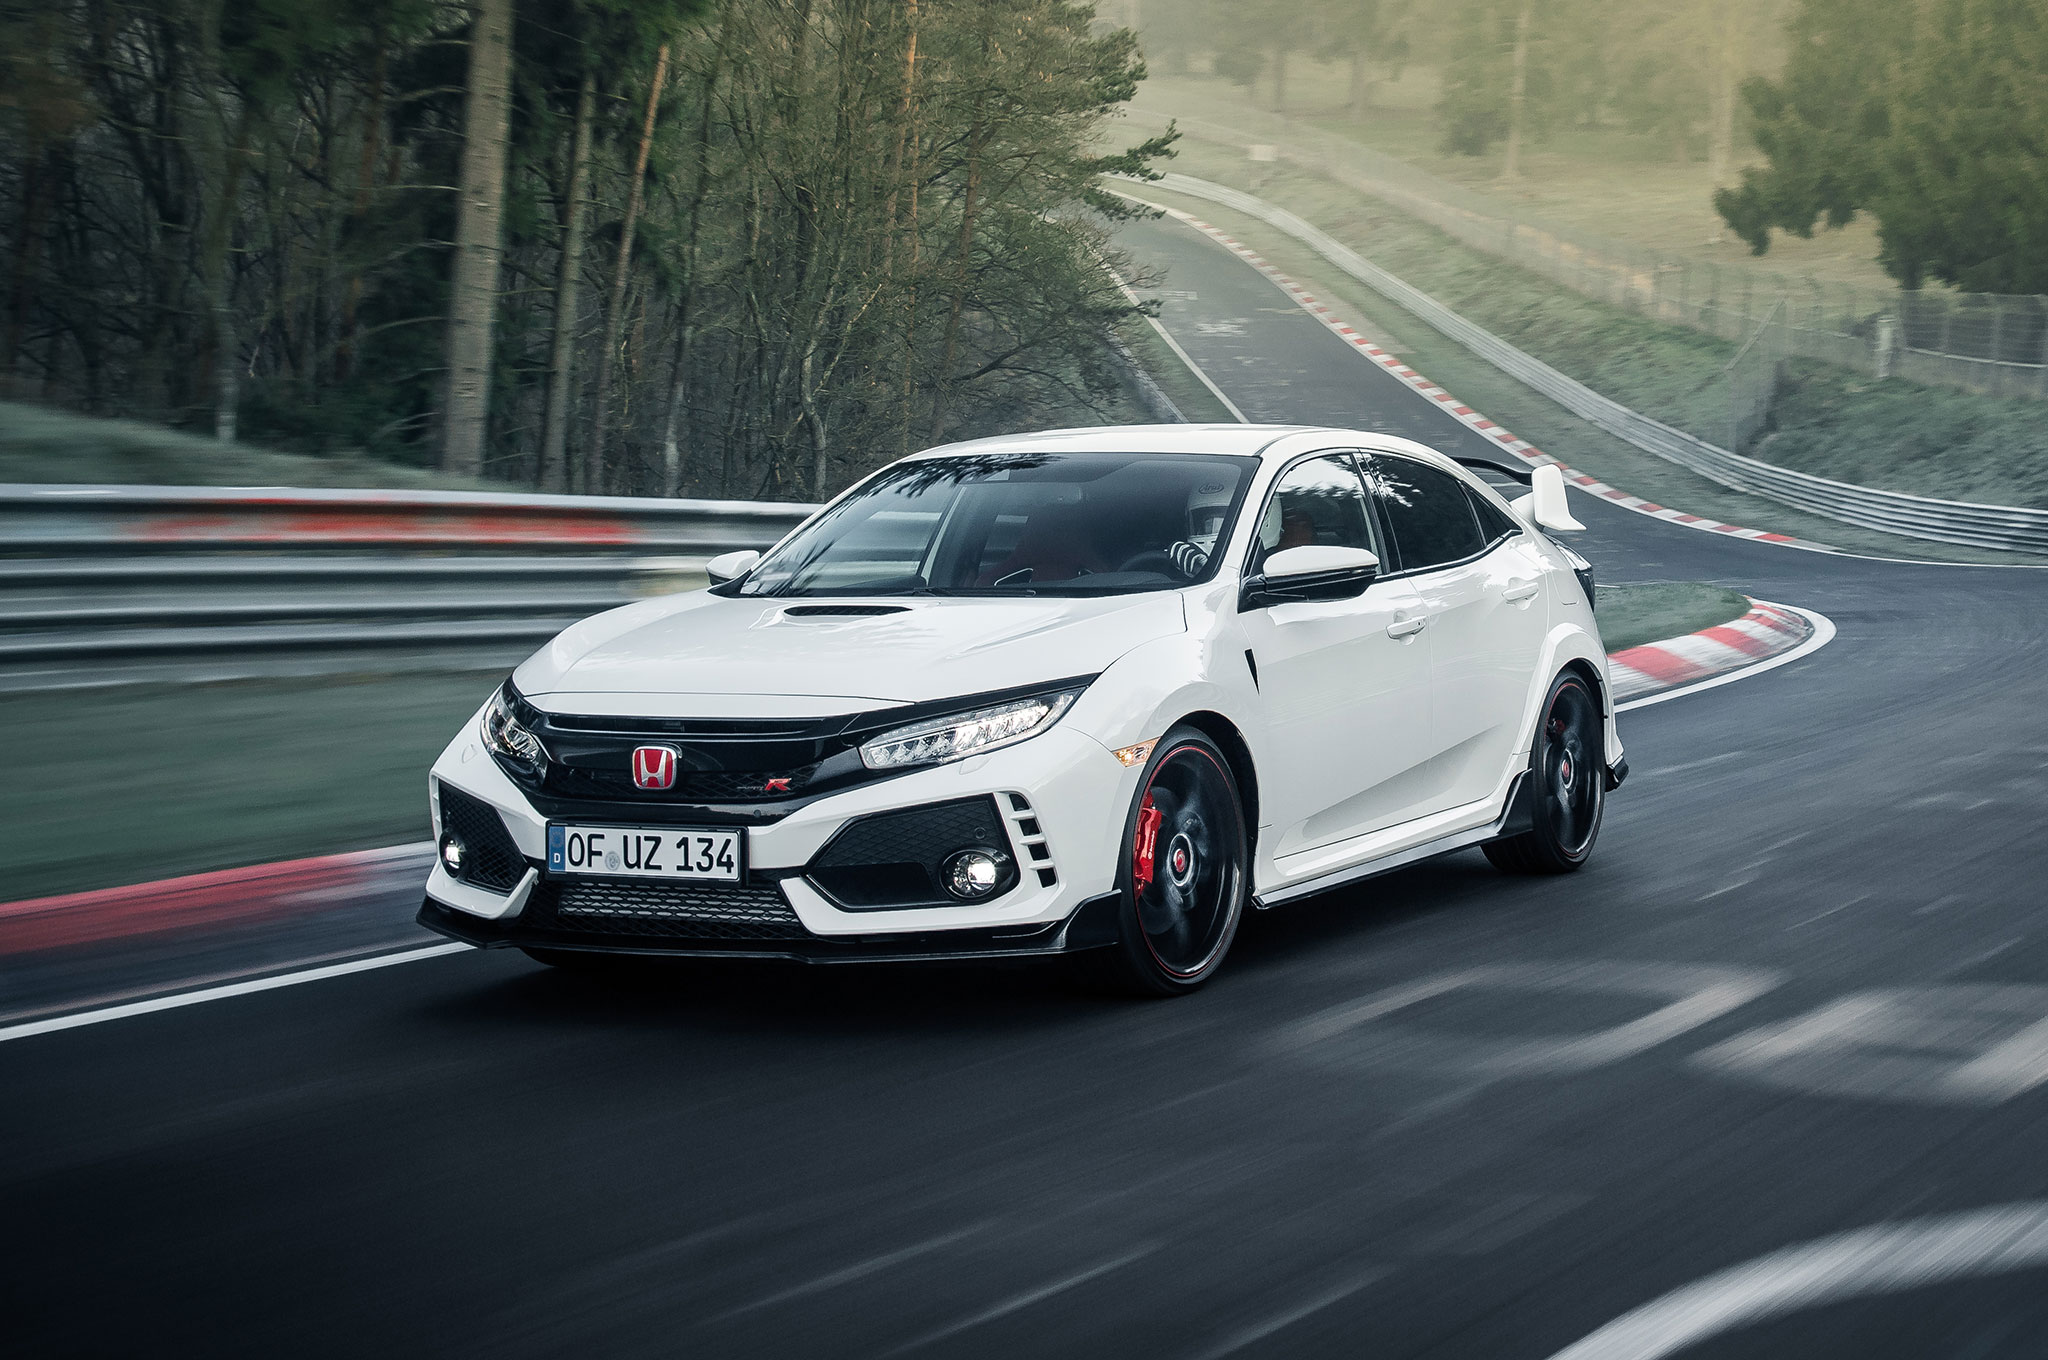 2017 Honda Civic Type R Front Three Quarter Motion